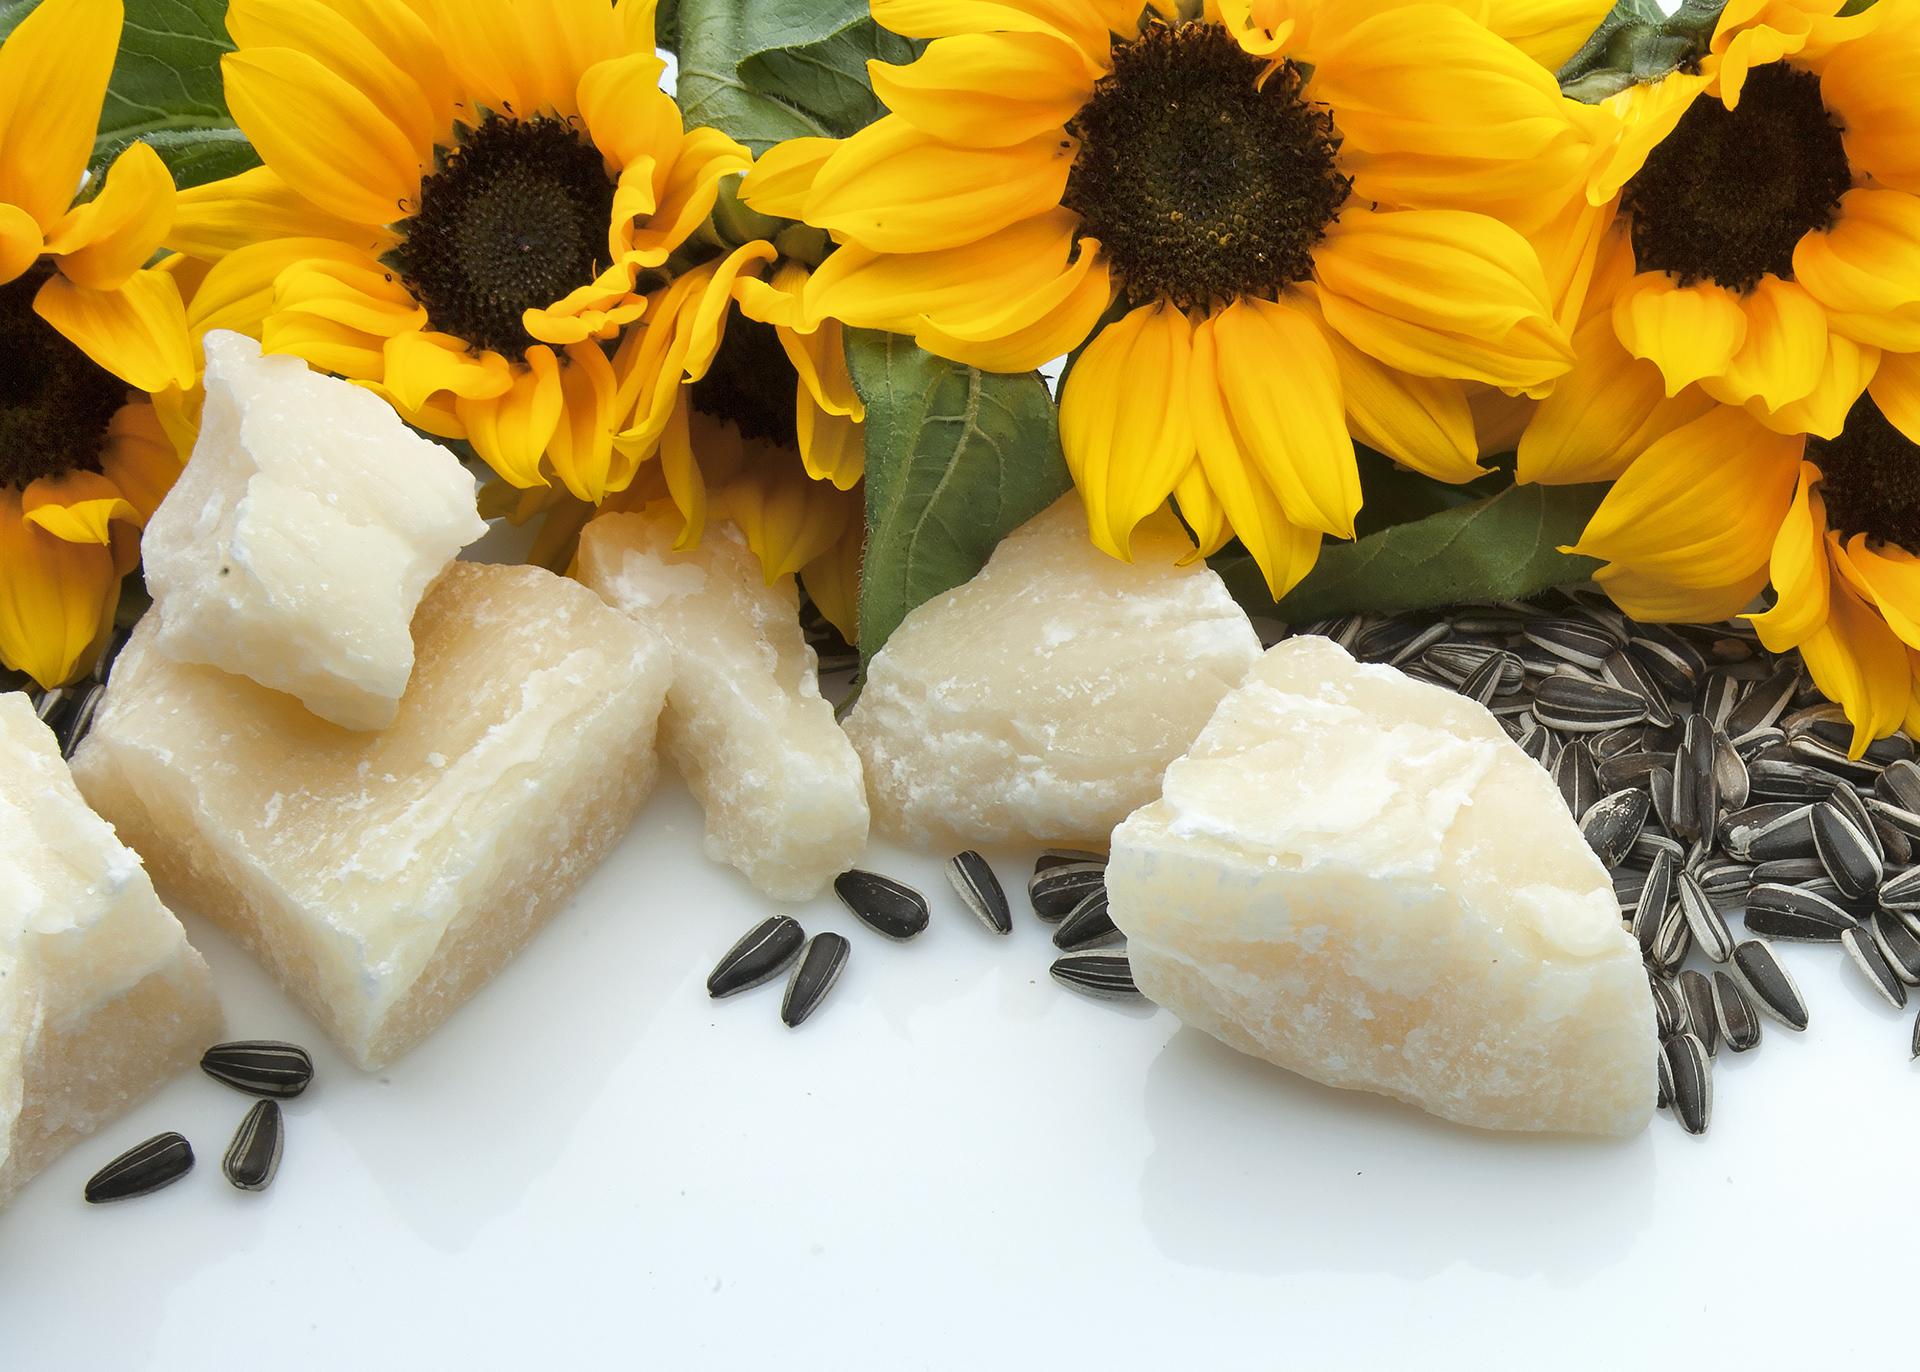 Sunflower-Wax_Henry-Lamotte-Oils